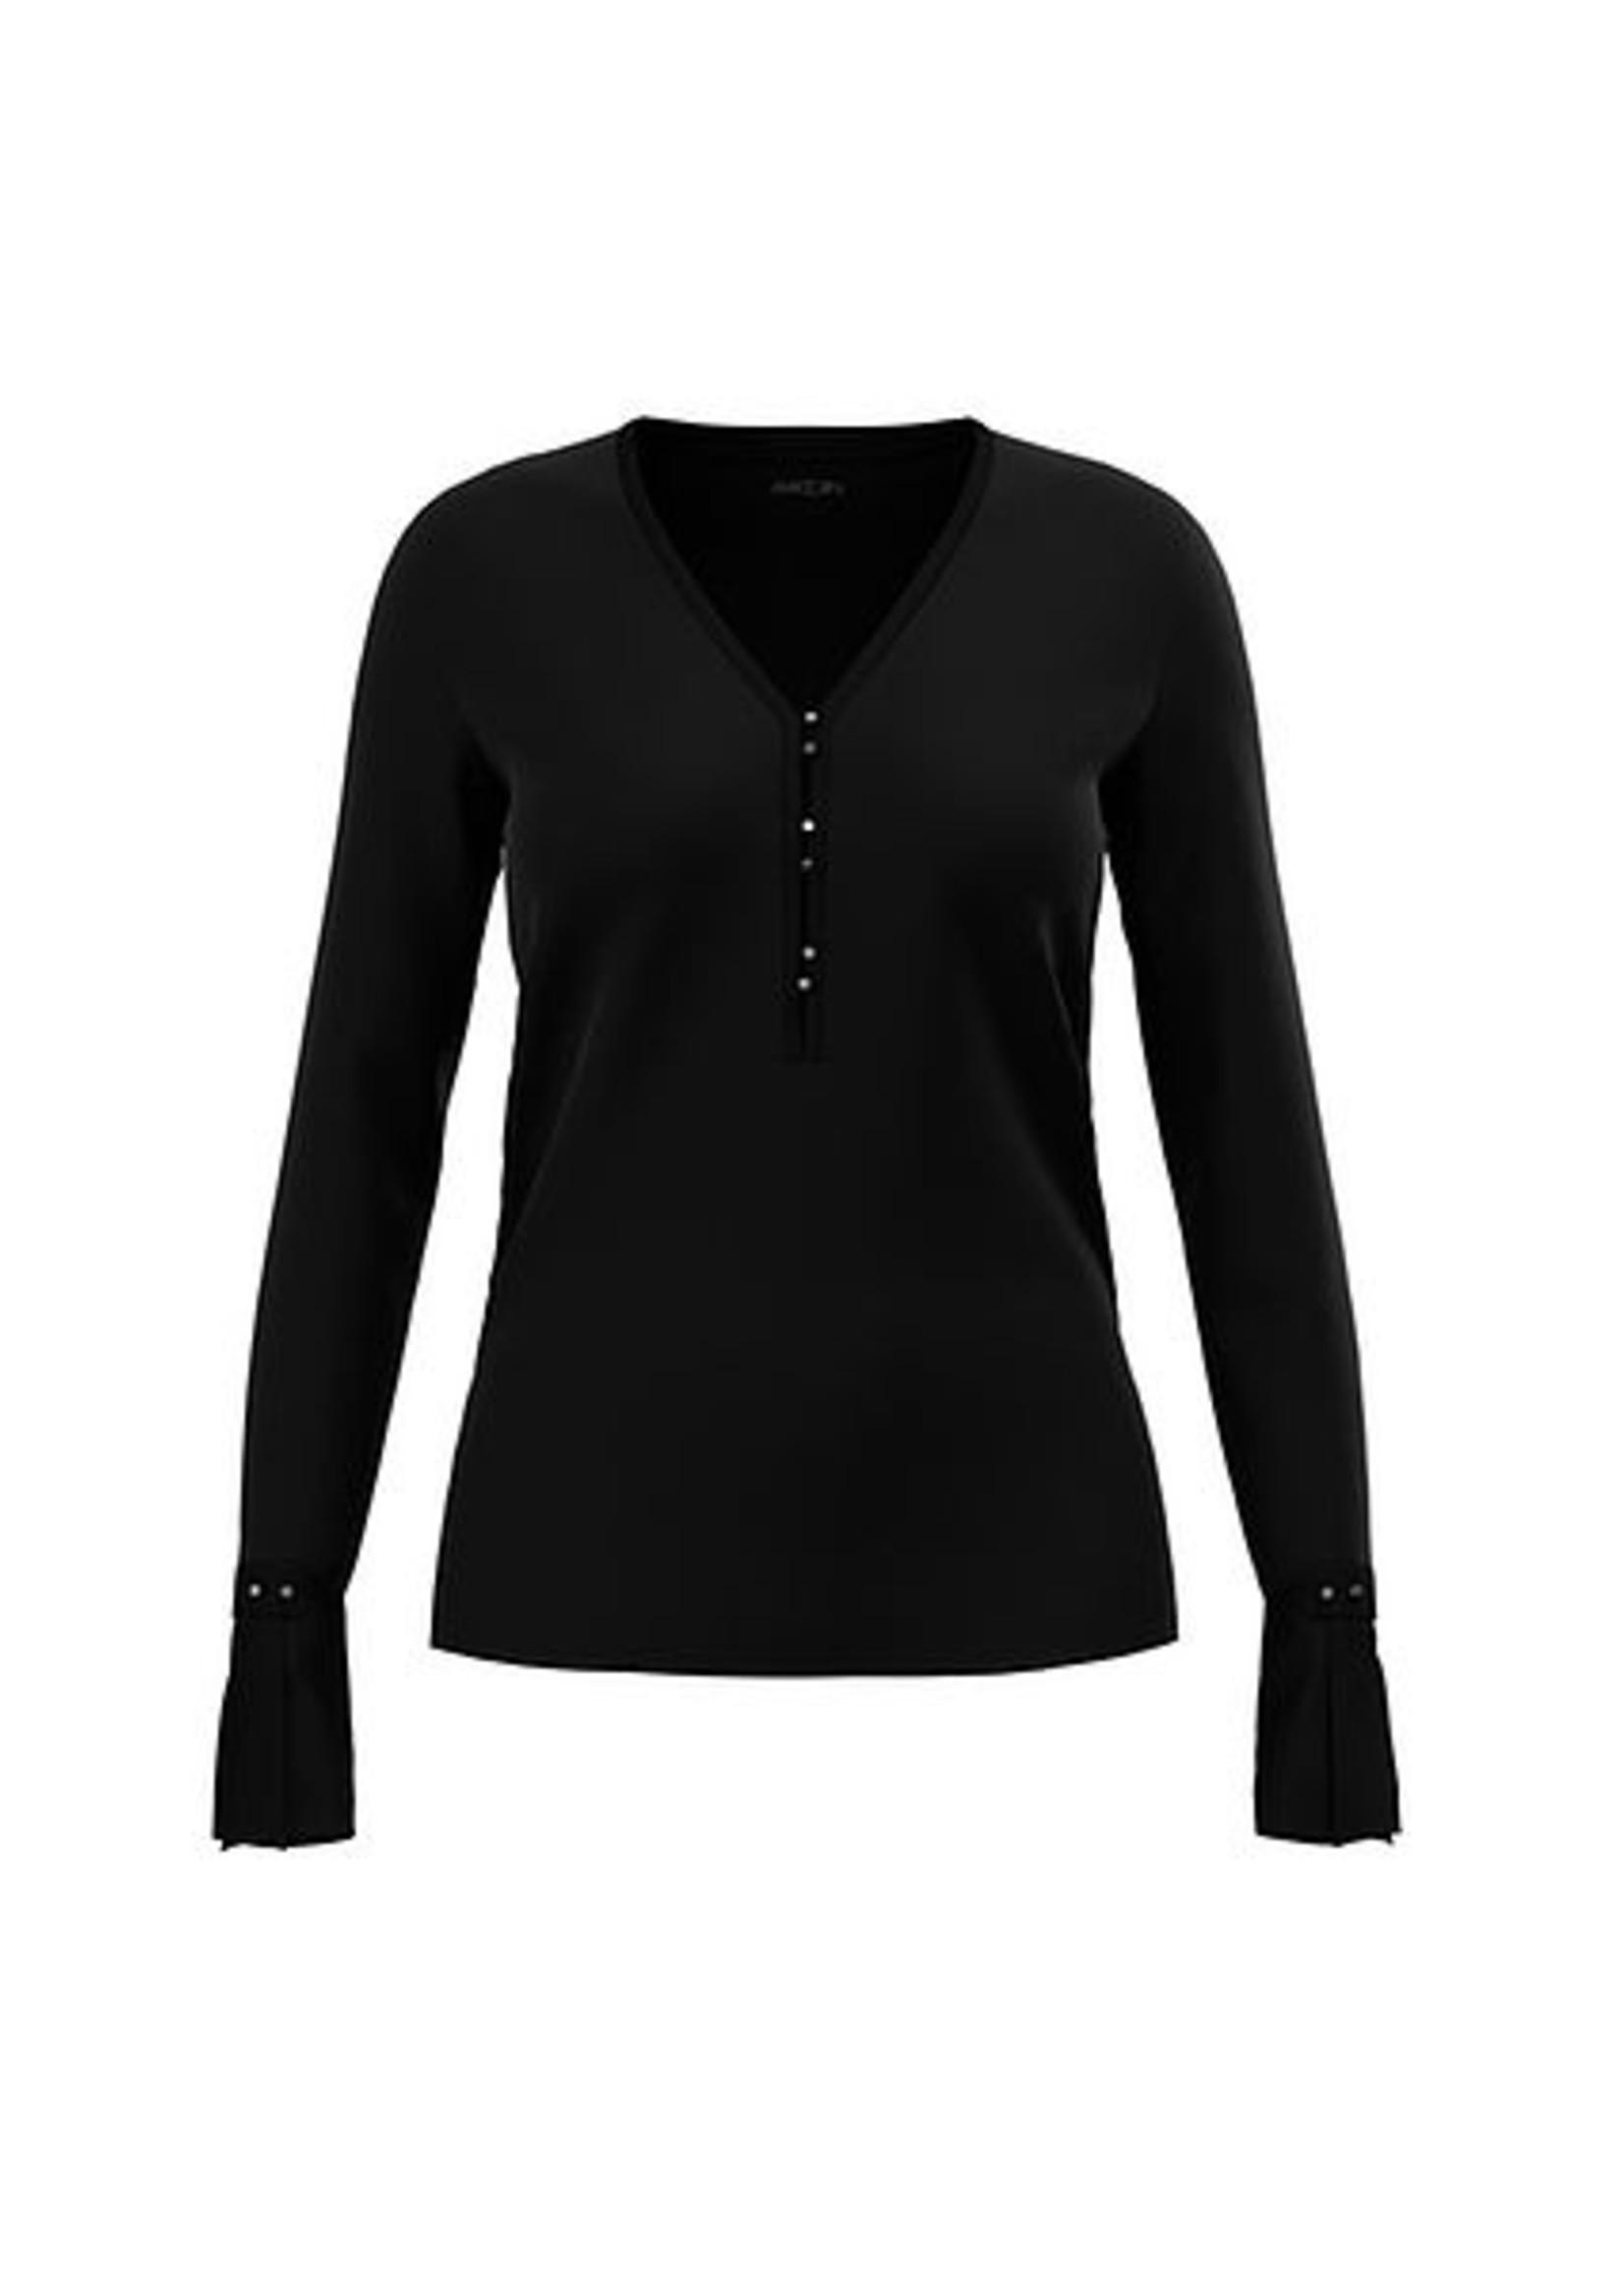 T-shirt RC 48.08 J14 black